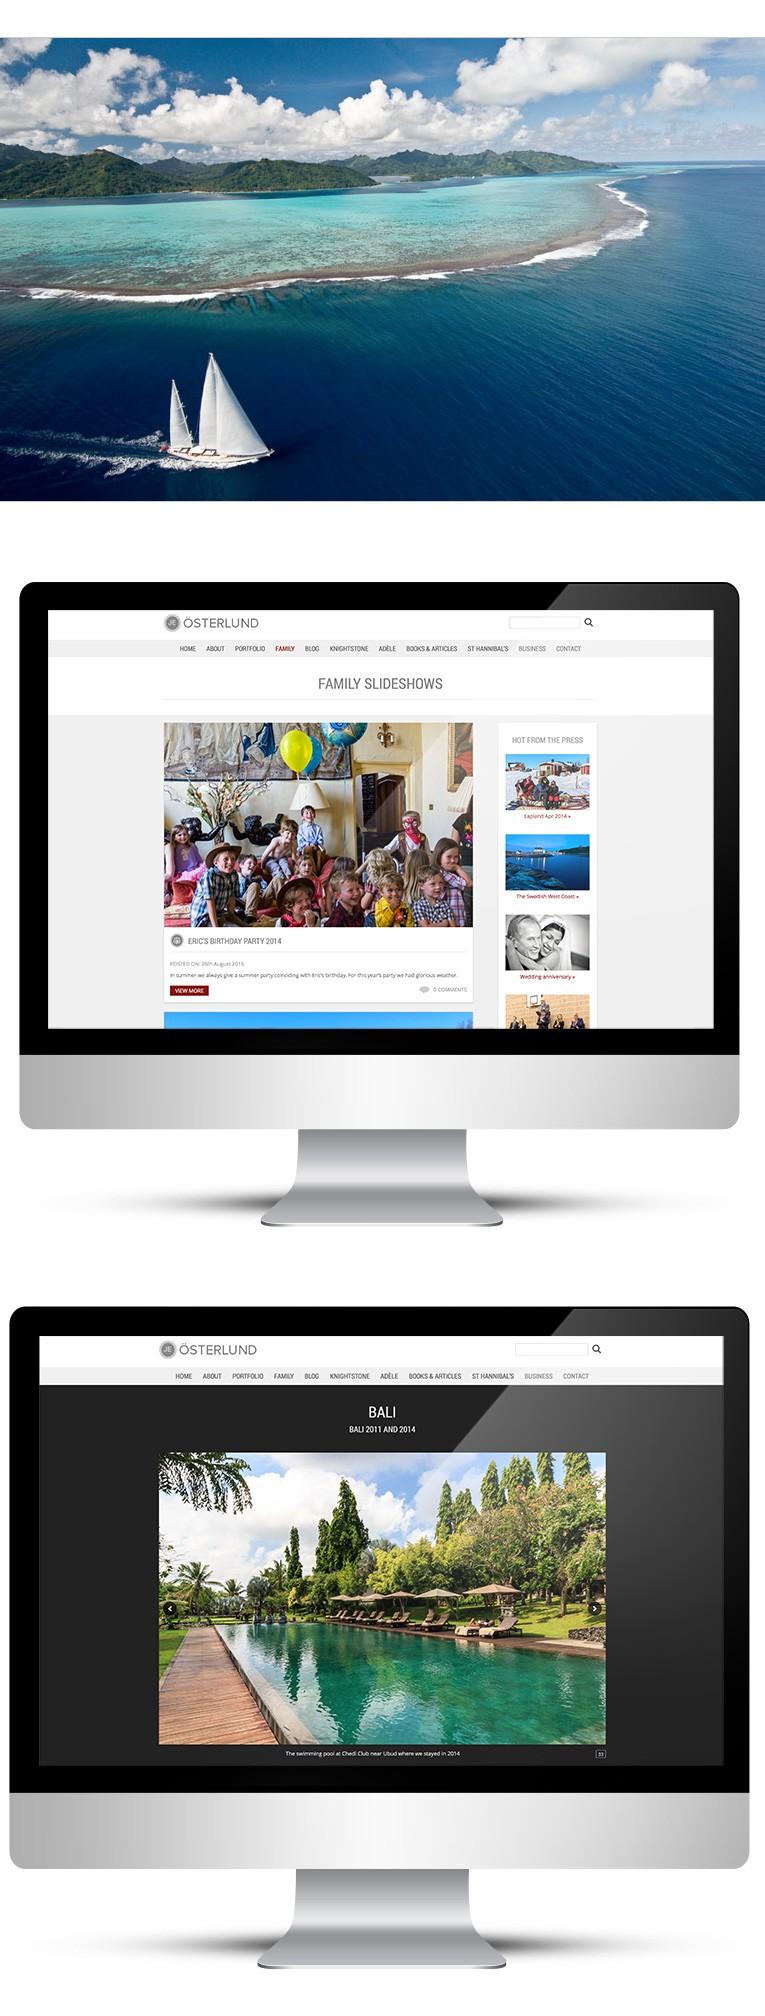 Desktop version of photography portfolio site